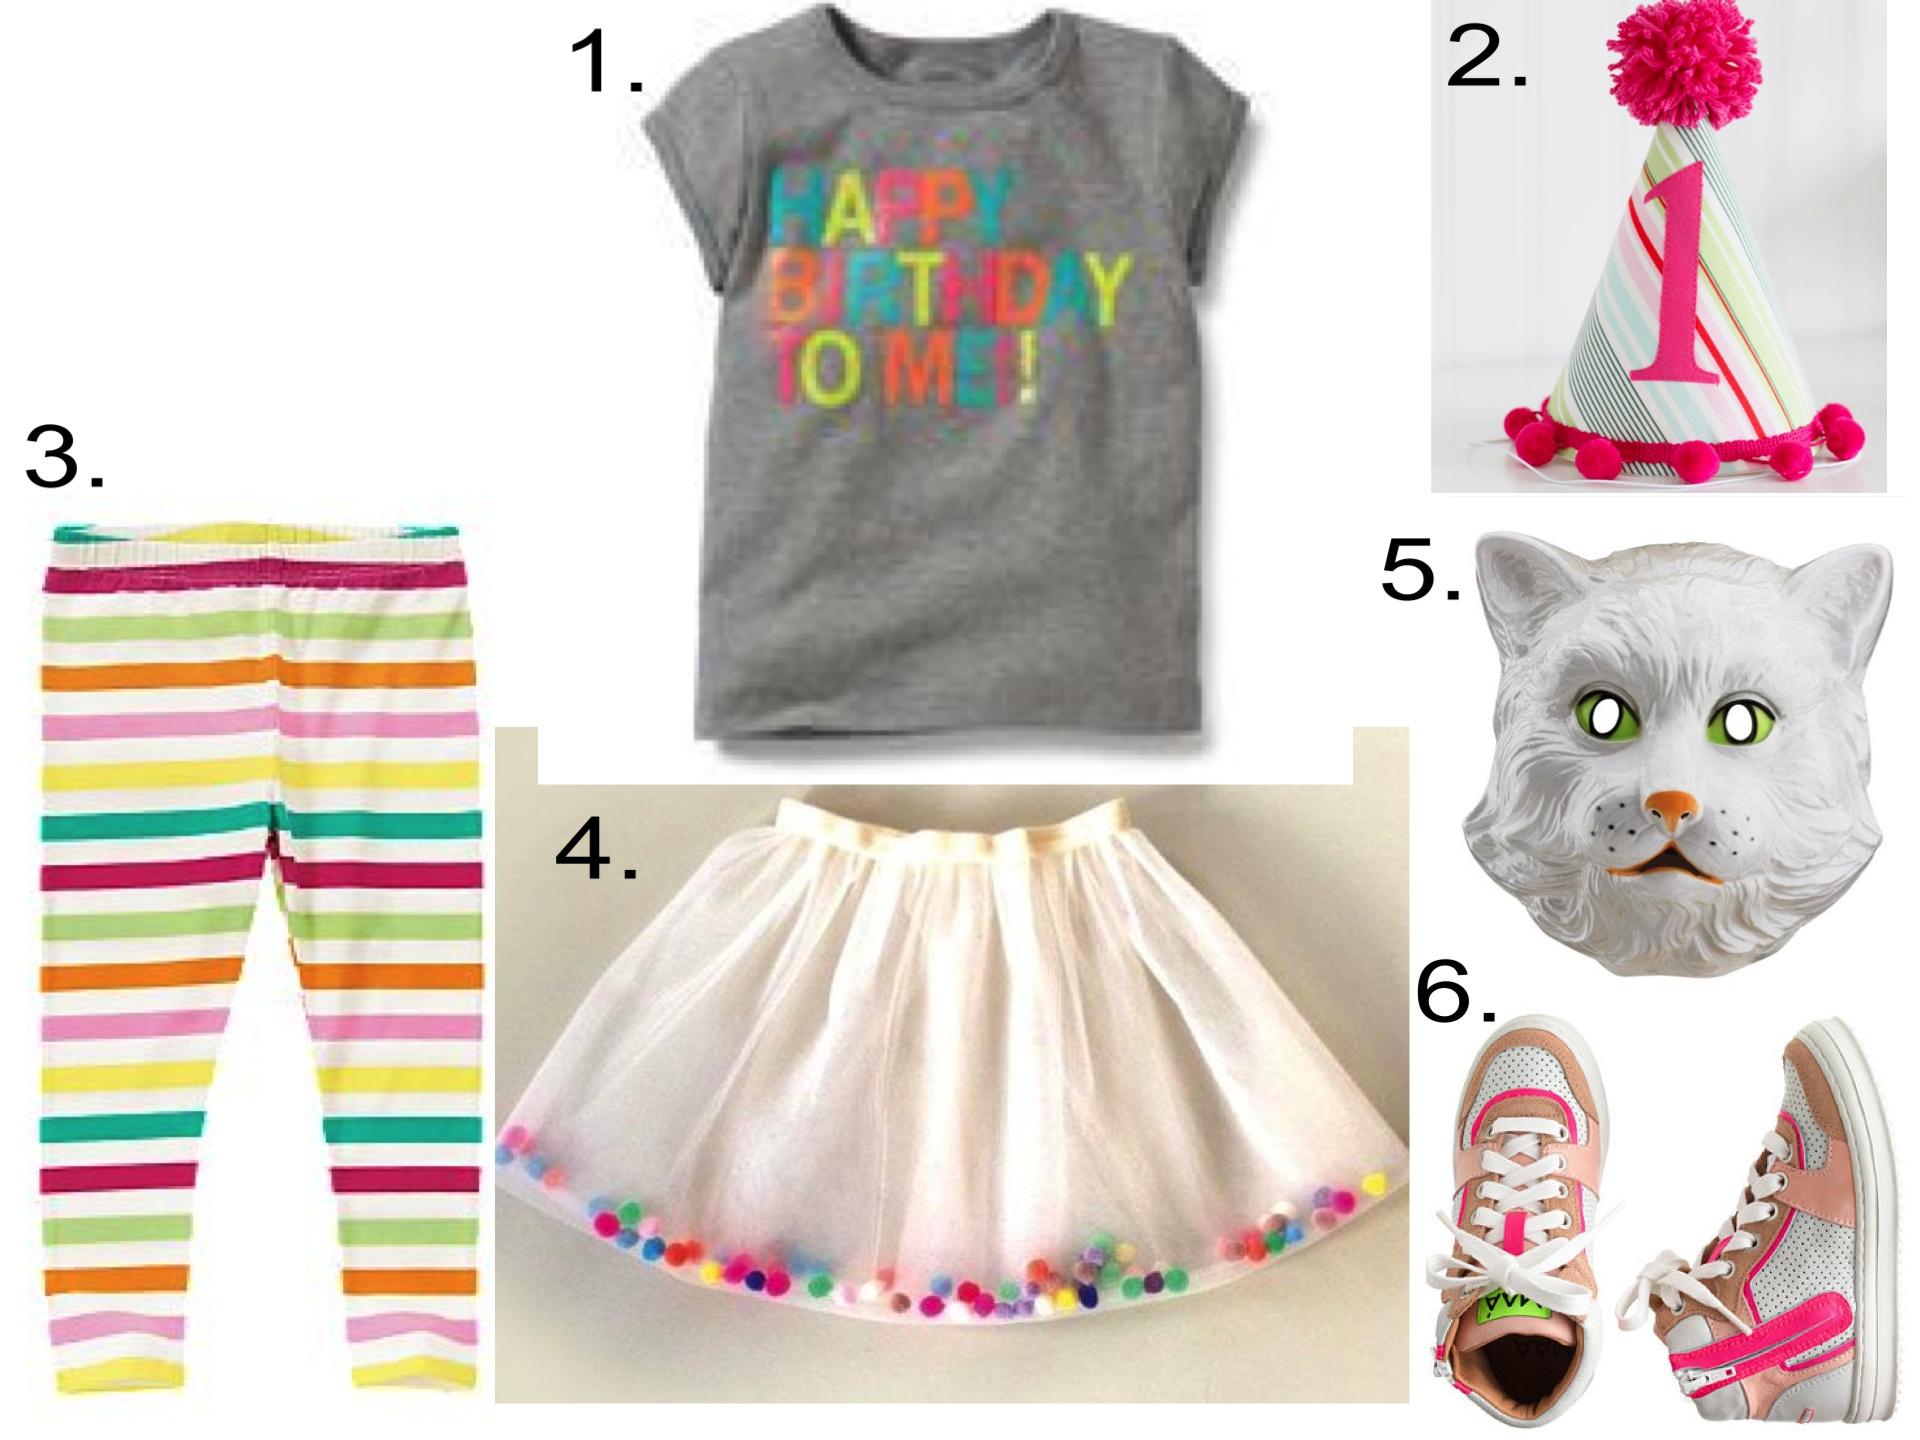 This Cute Birthday Tutu is DIY!  1.  Carter's Happy Birthday Tee |2.  PaisleyHandmade Girls Party Hat |3.  Crazy8 Stripe Leggings |4.  MoodKids Pompom DIY tutu |5.  Disguise Child White Cat Mask  |6.  J.Crew KIDS' MAA™ HIGH-TOPS